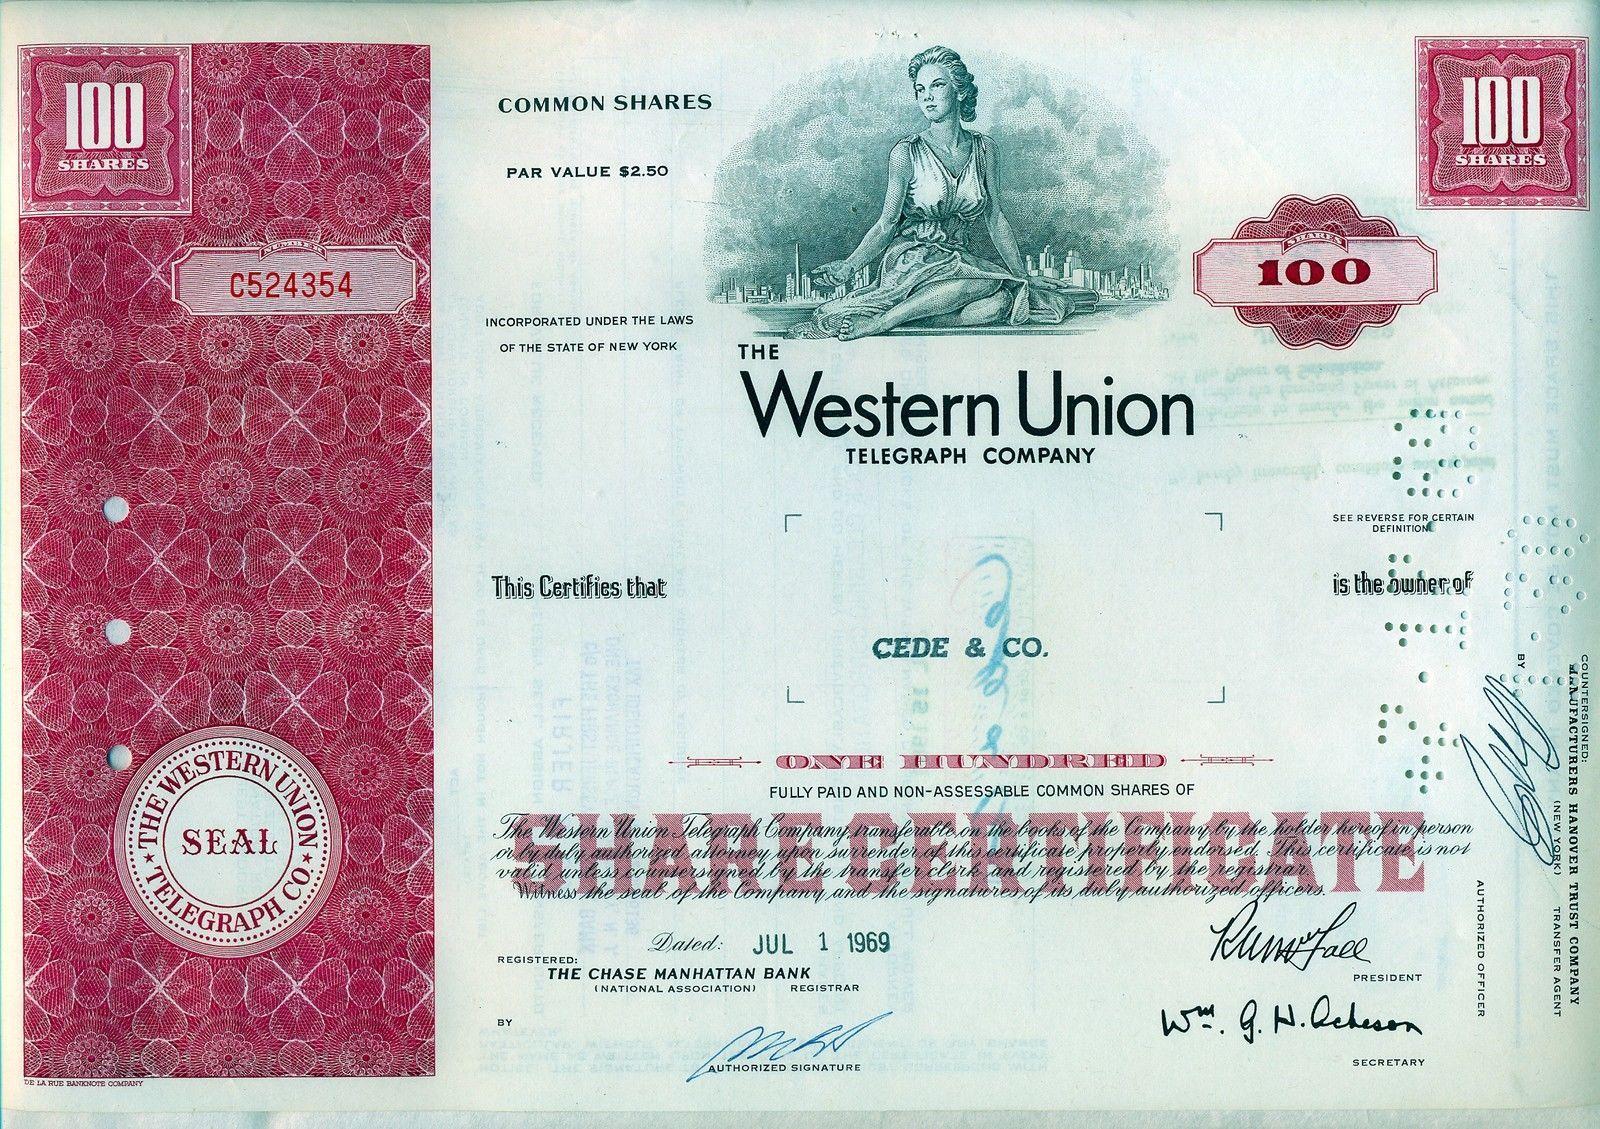 New England Telephone /& Telegraph Company Bond Stock Certificate